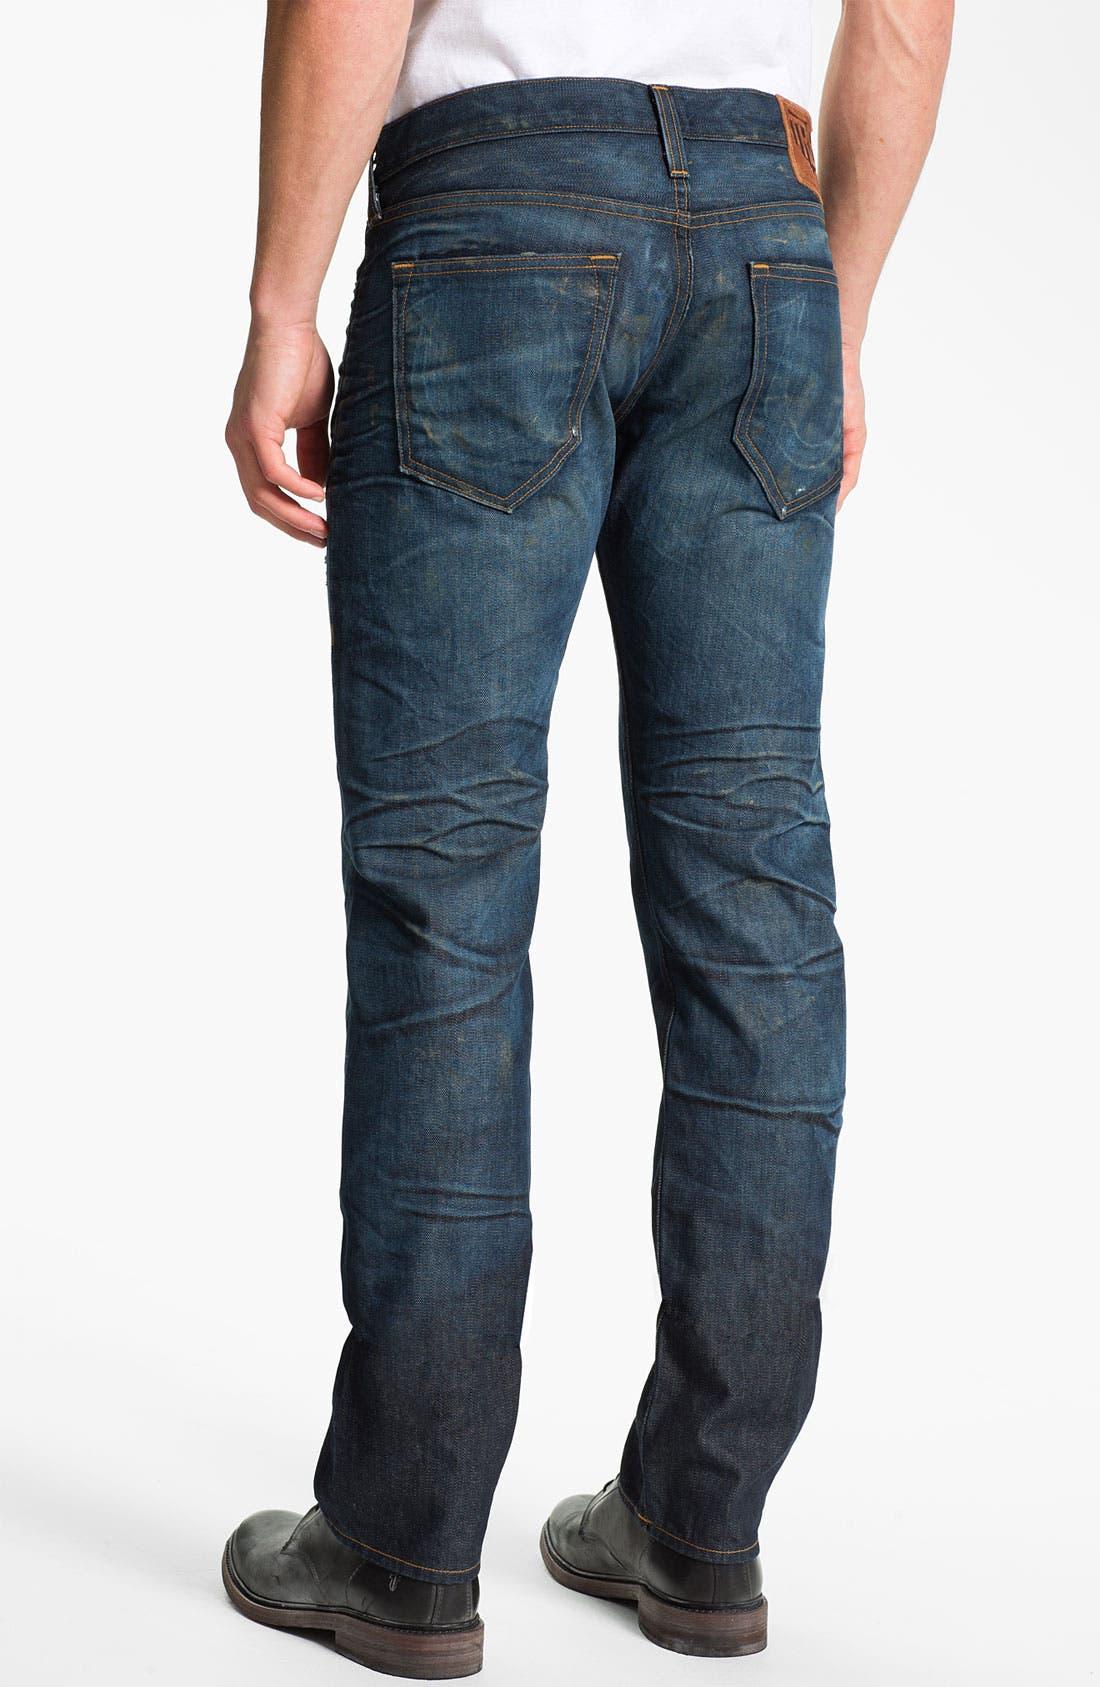 Main Image - True Religion Brand Jeans 'Geno 1971' Slim Straight Leg Jeans (Hideout)